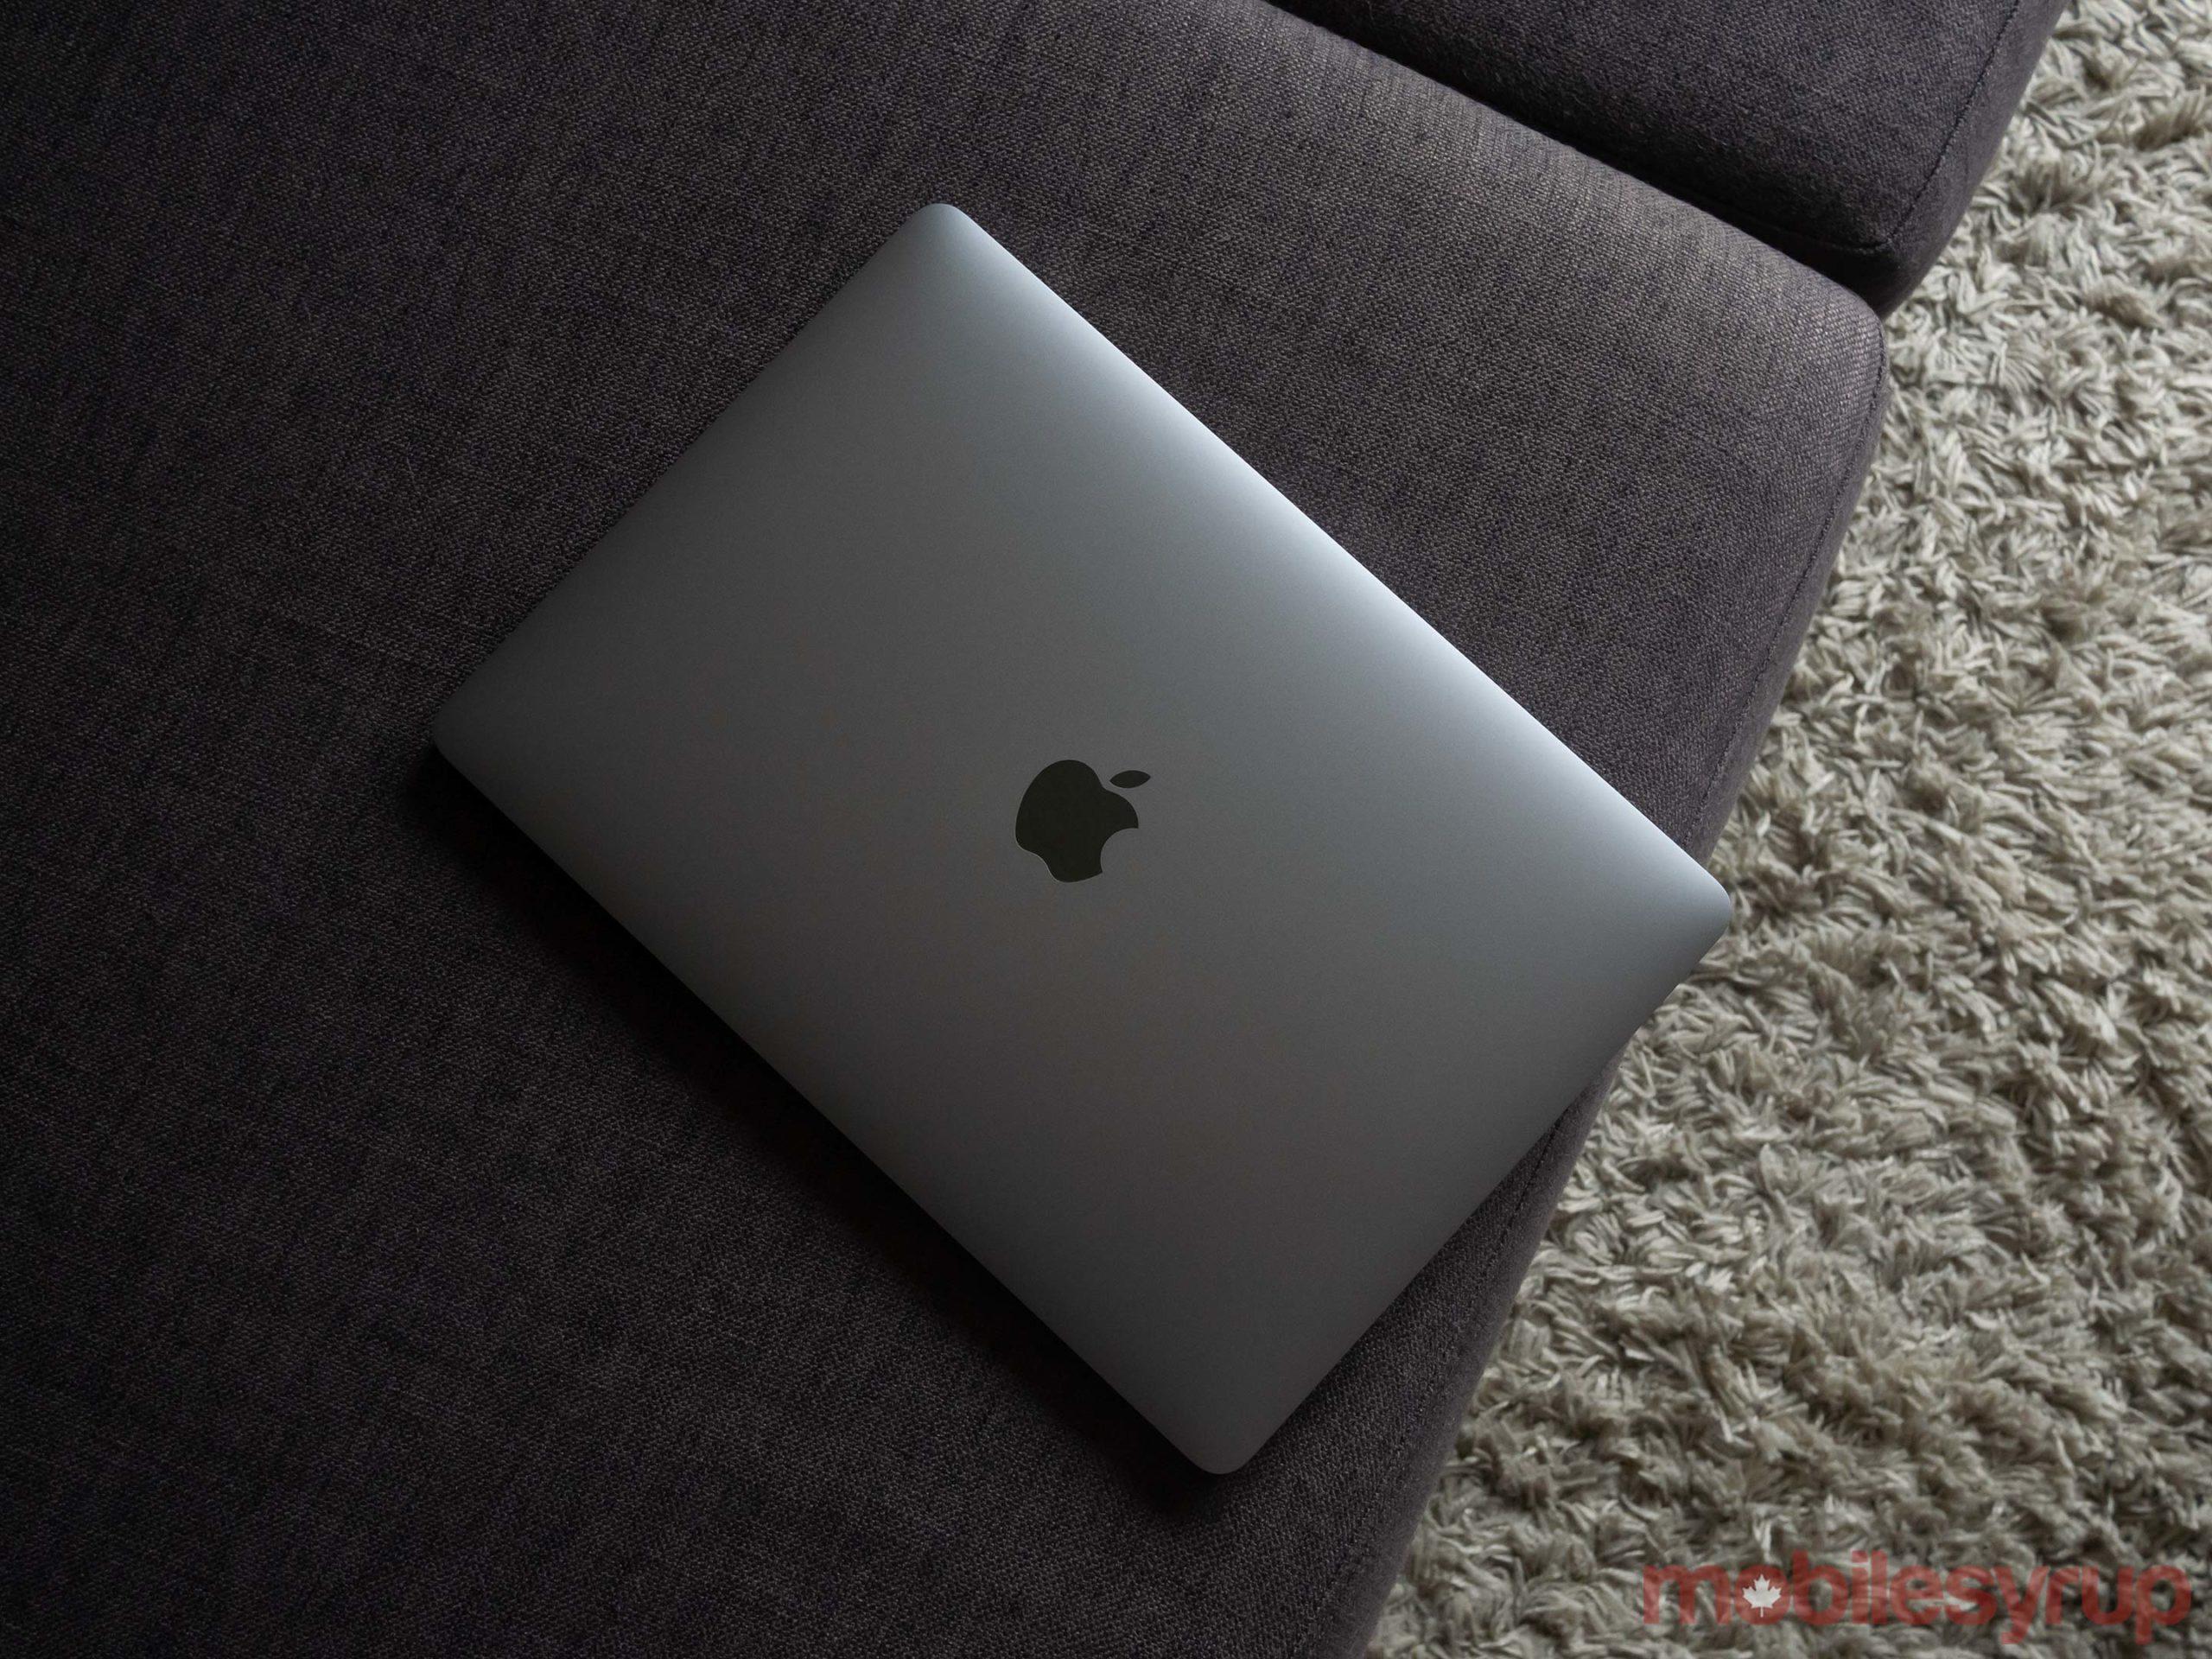 MacBook Air (2020) top down